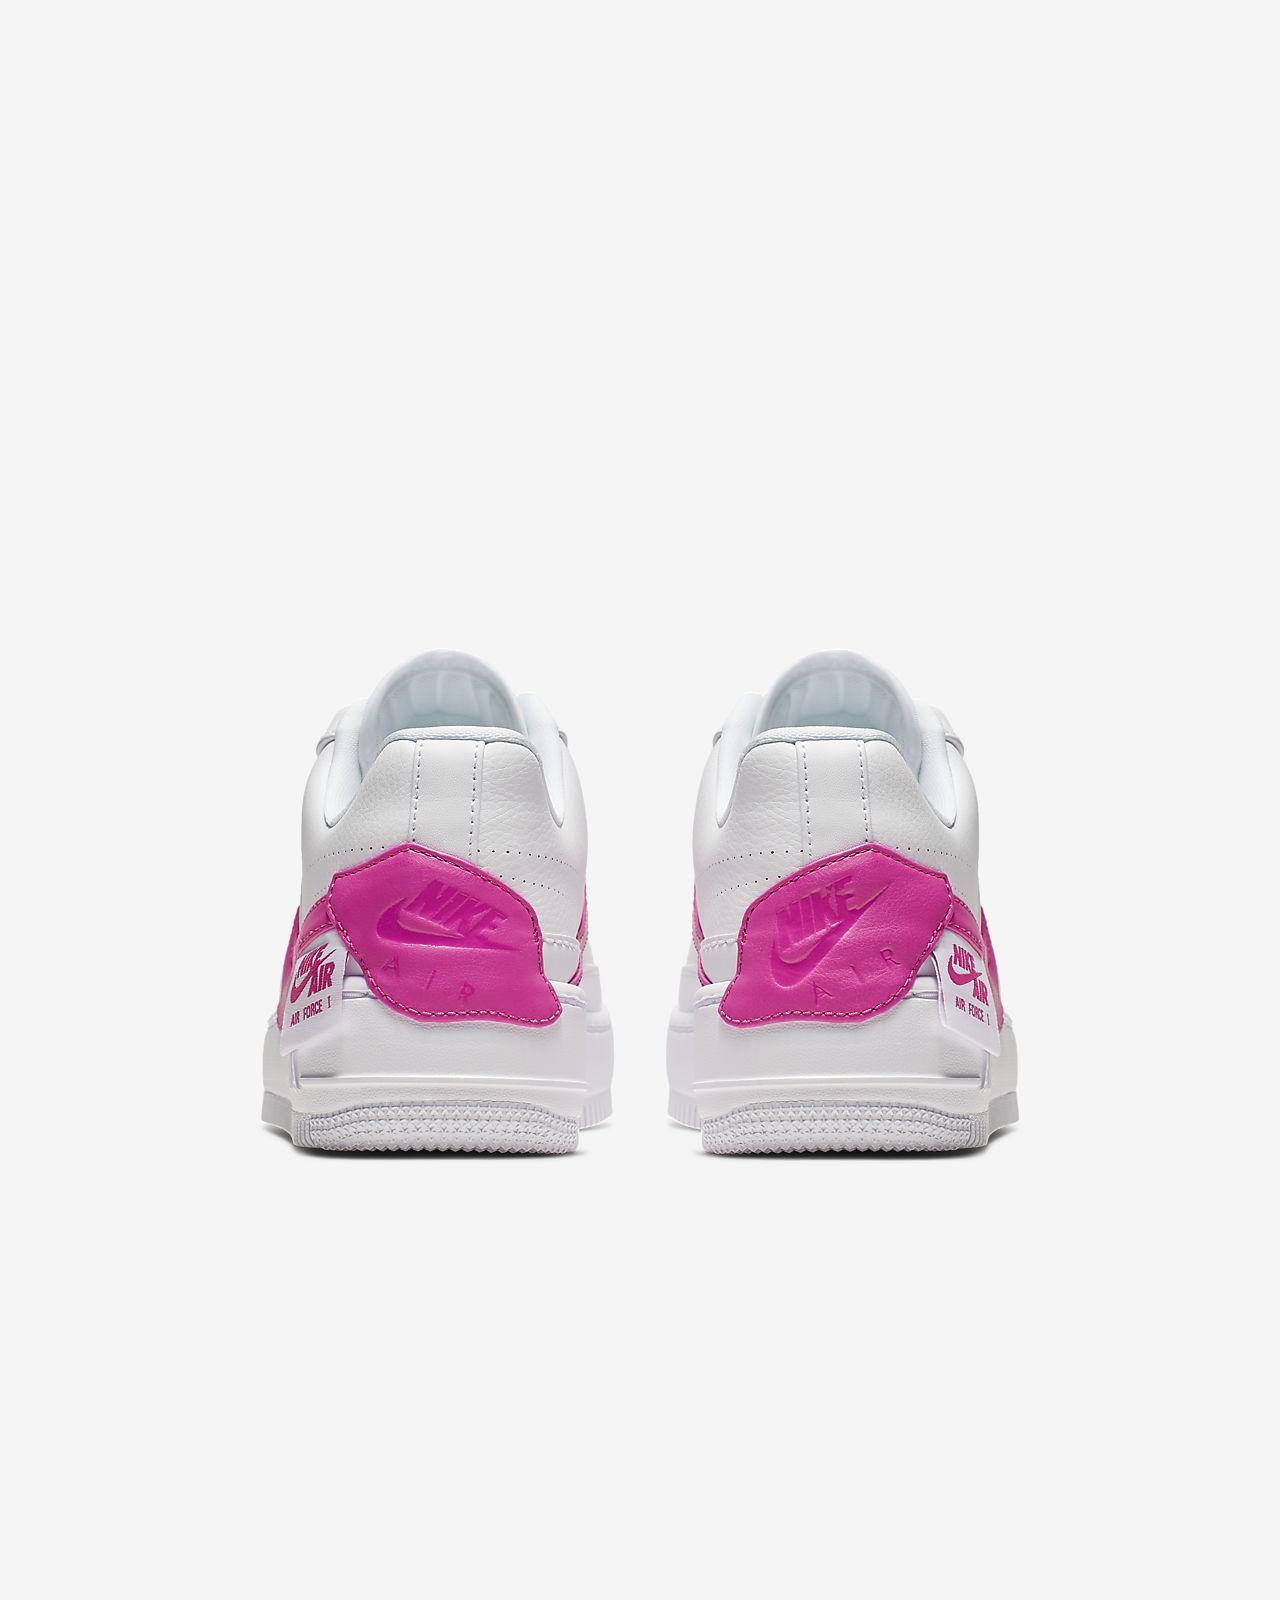 70d0f4e22 Nike Air Force 1 Jester XX Shoe. Nike.com CA